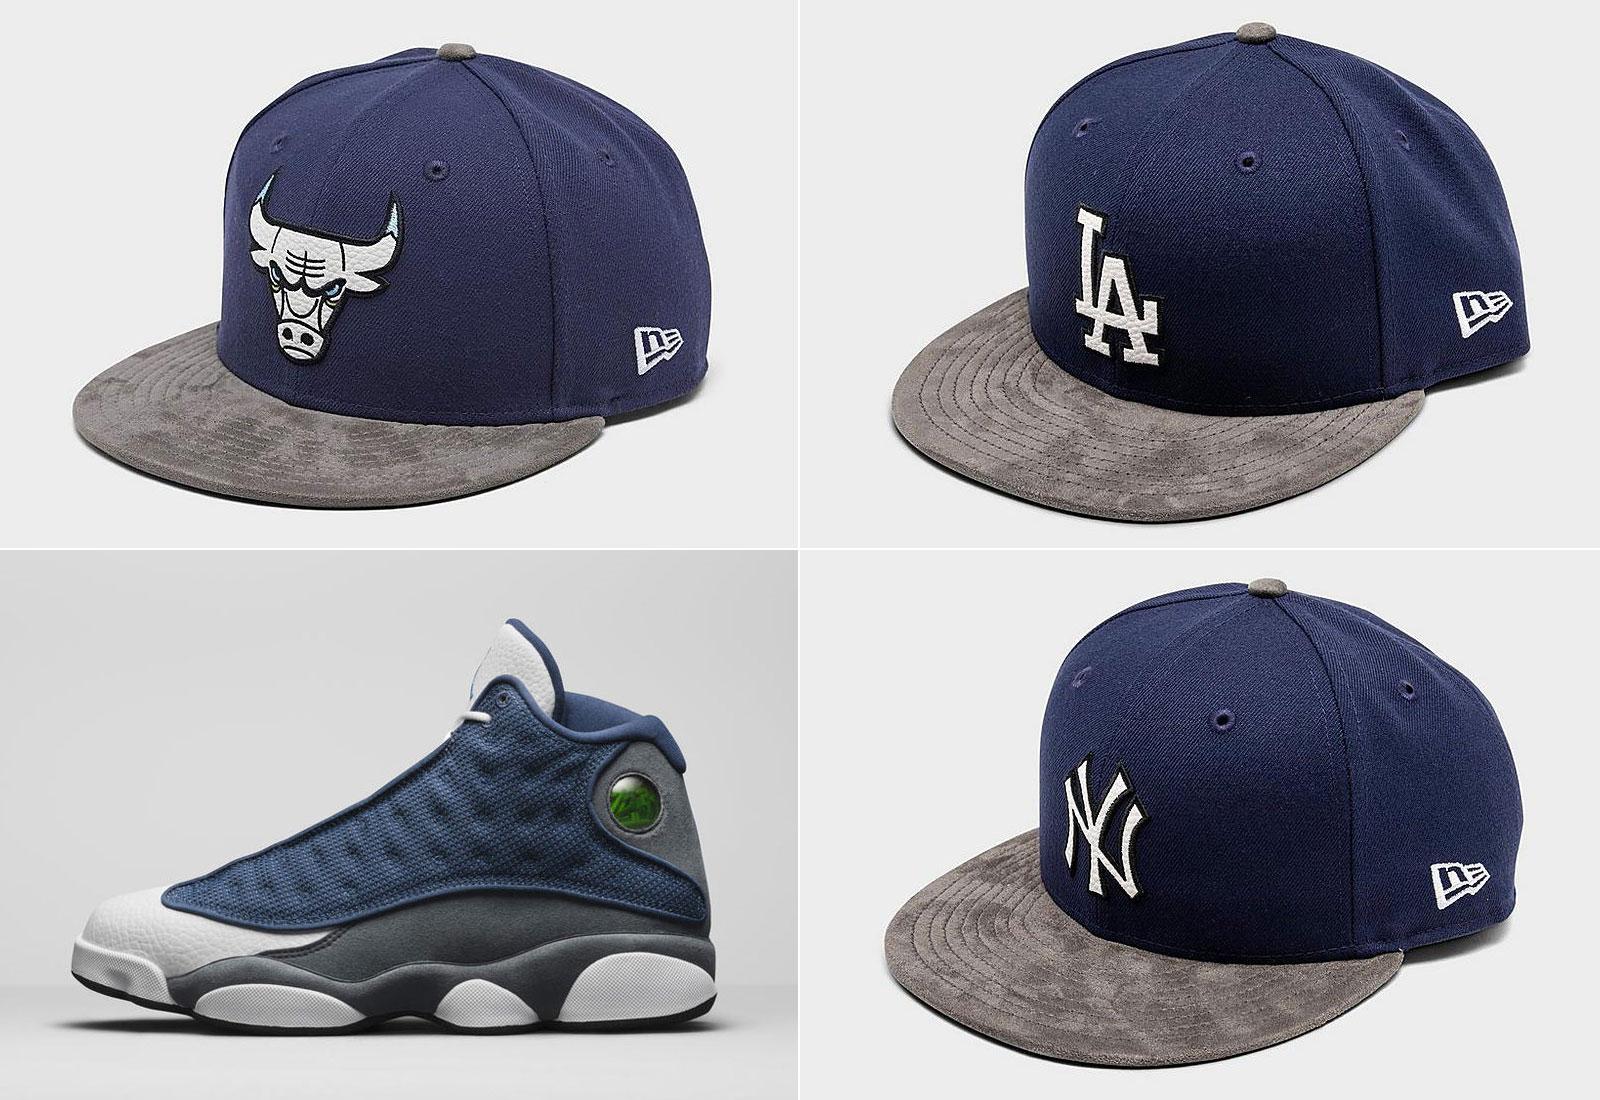 air-jordan-13-flint-new-era-hats